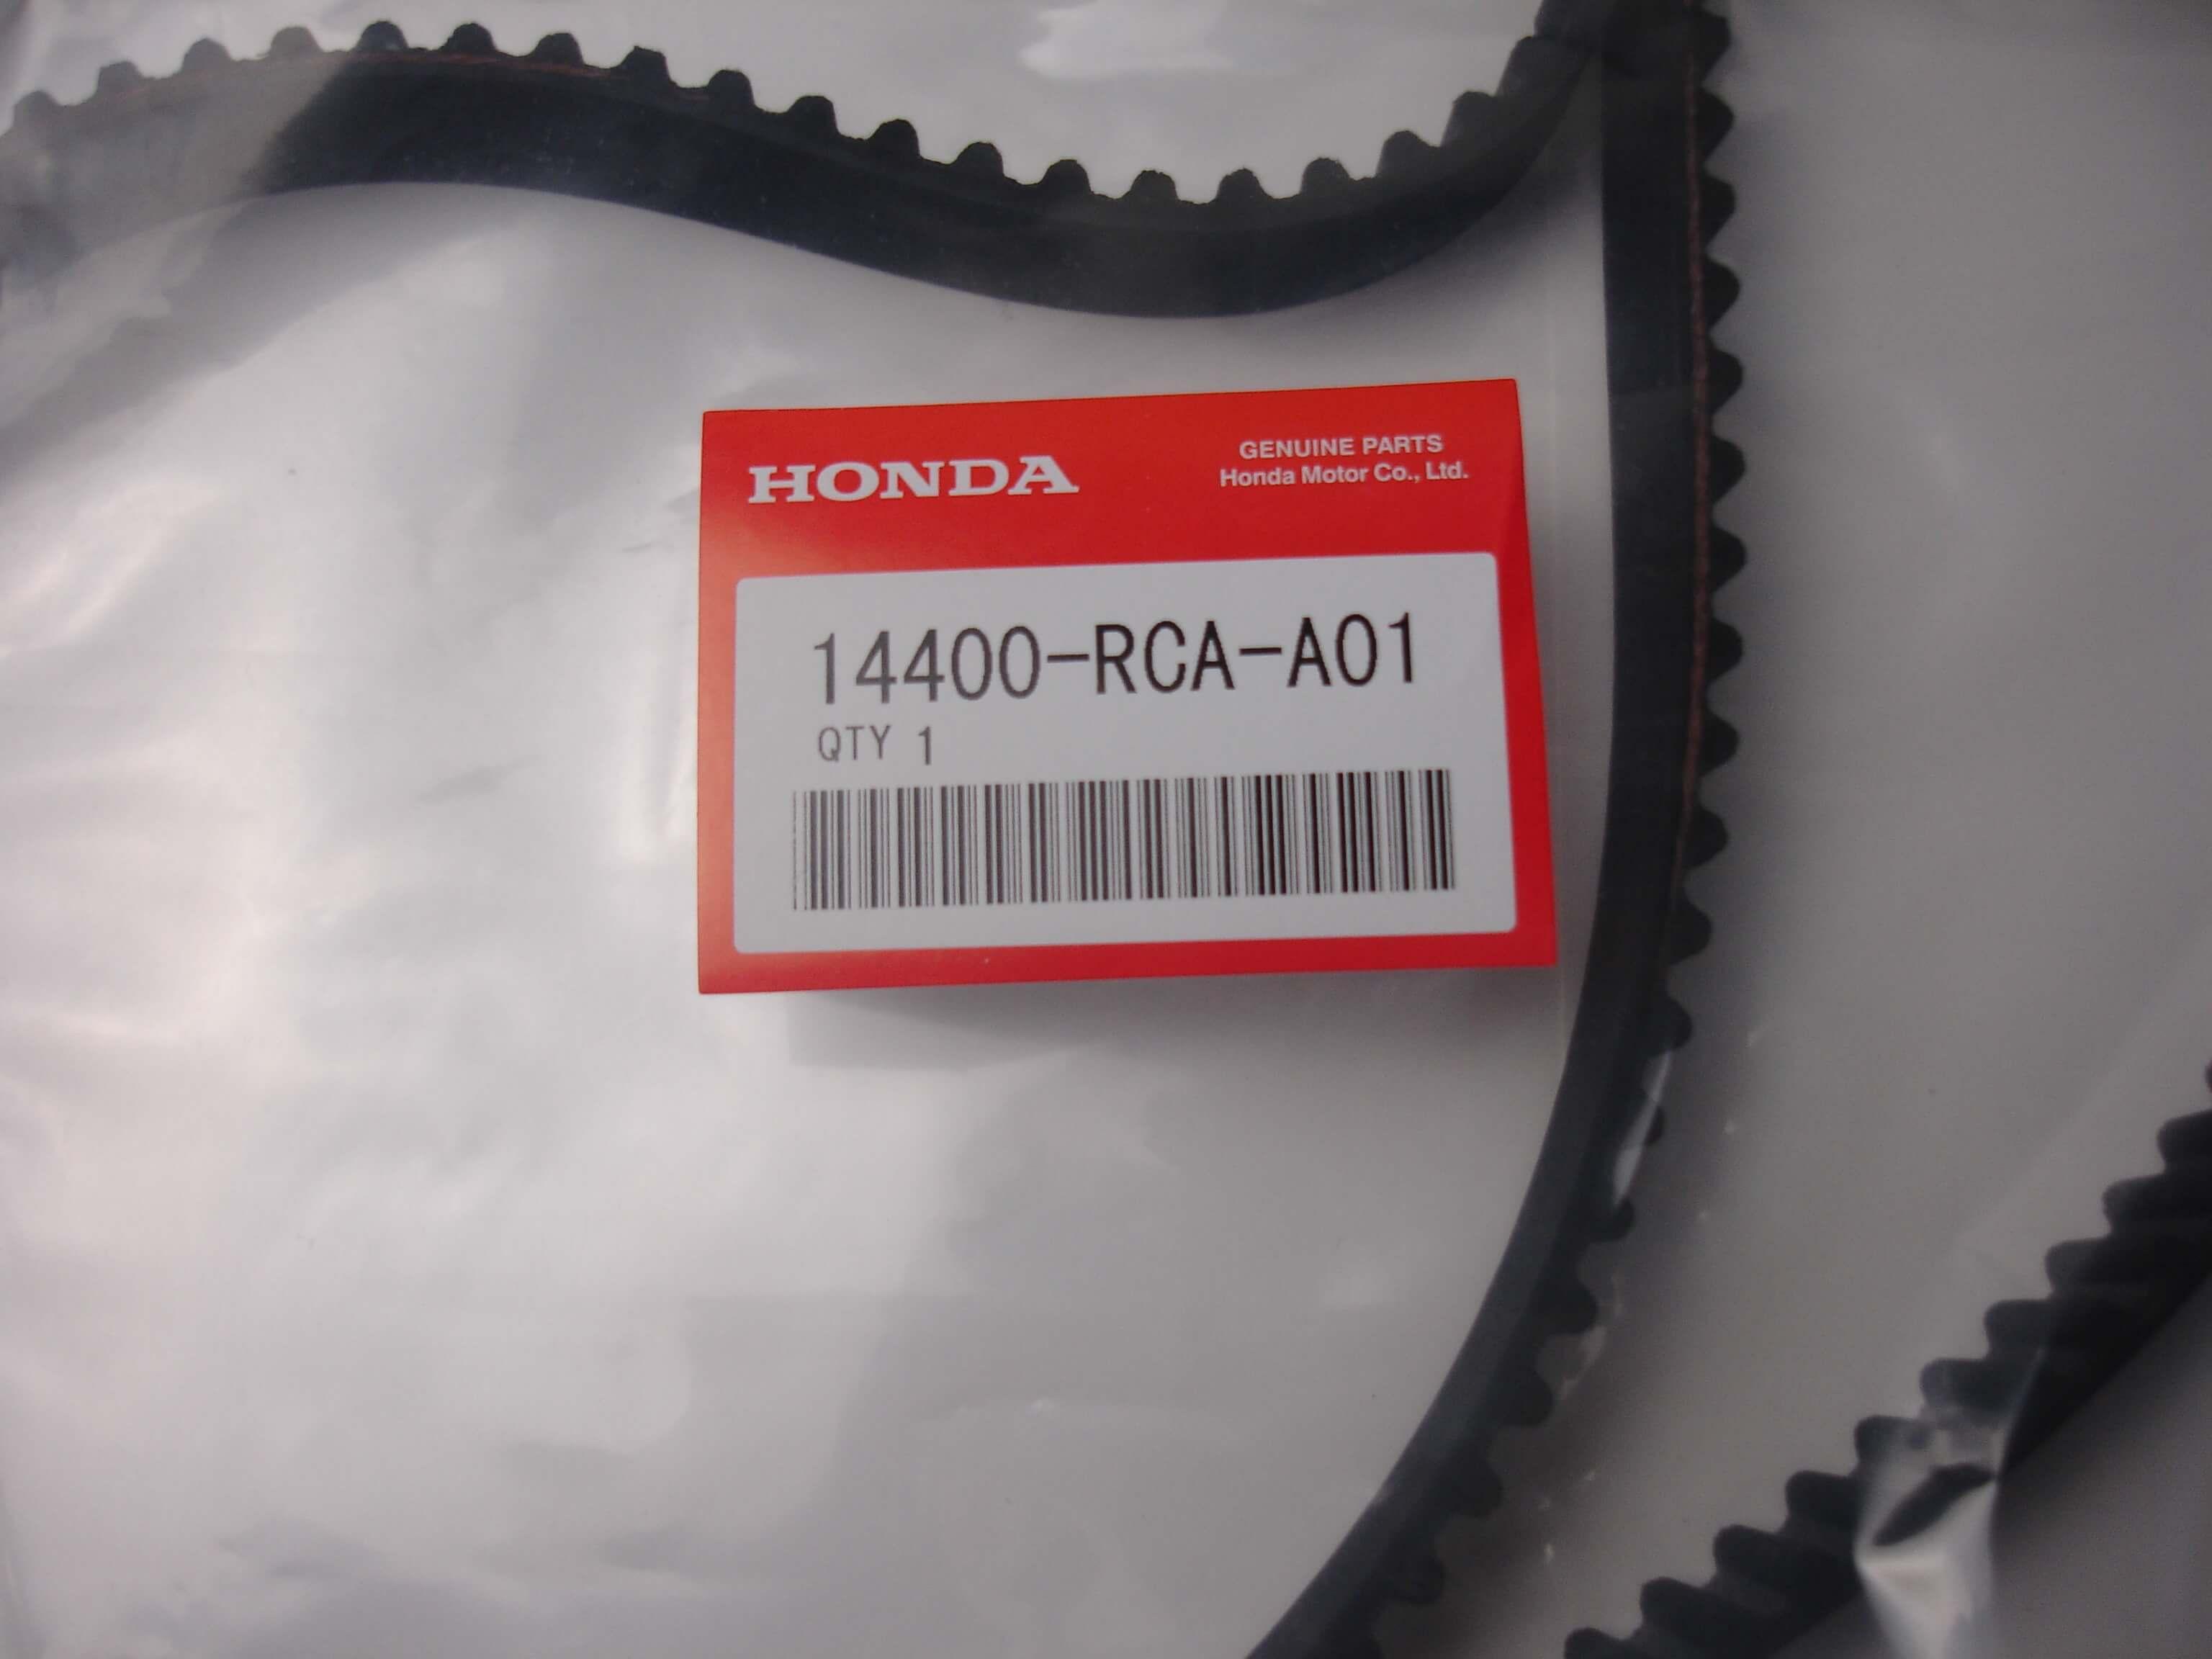 OEM Timing Belt for Honda 3.5L V6 part number 14400-RCA-A01 197YU20. 2003-2014 Accord including Hybrid. 2010-2014 Crosstour with V6. 2005-2014 Odyssey. 2006-2014 Ridgeline. 2005-2014 Pilot.